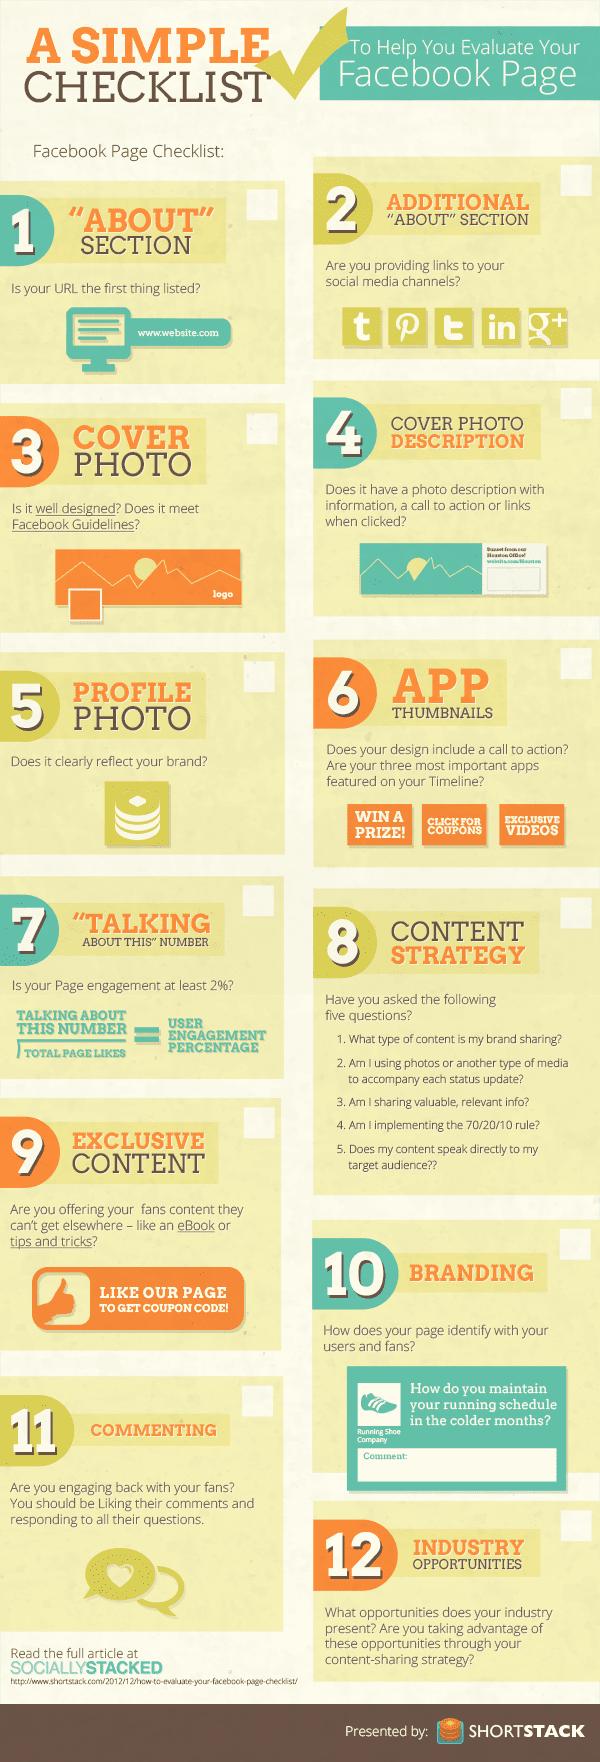 Checklist om je Facebookpagina te evalueren [infographic]